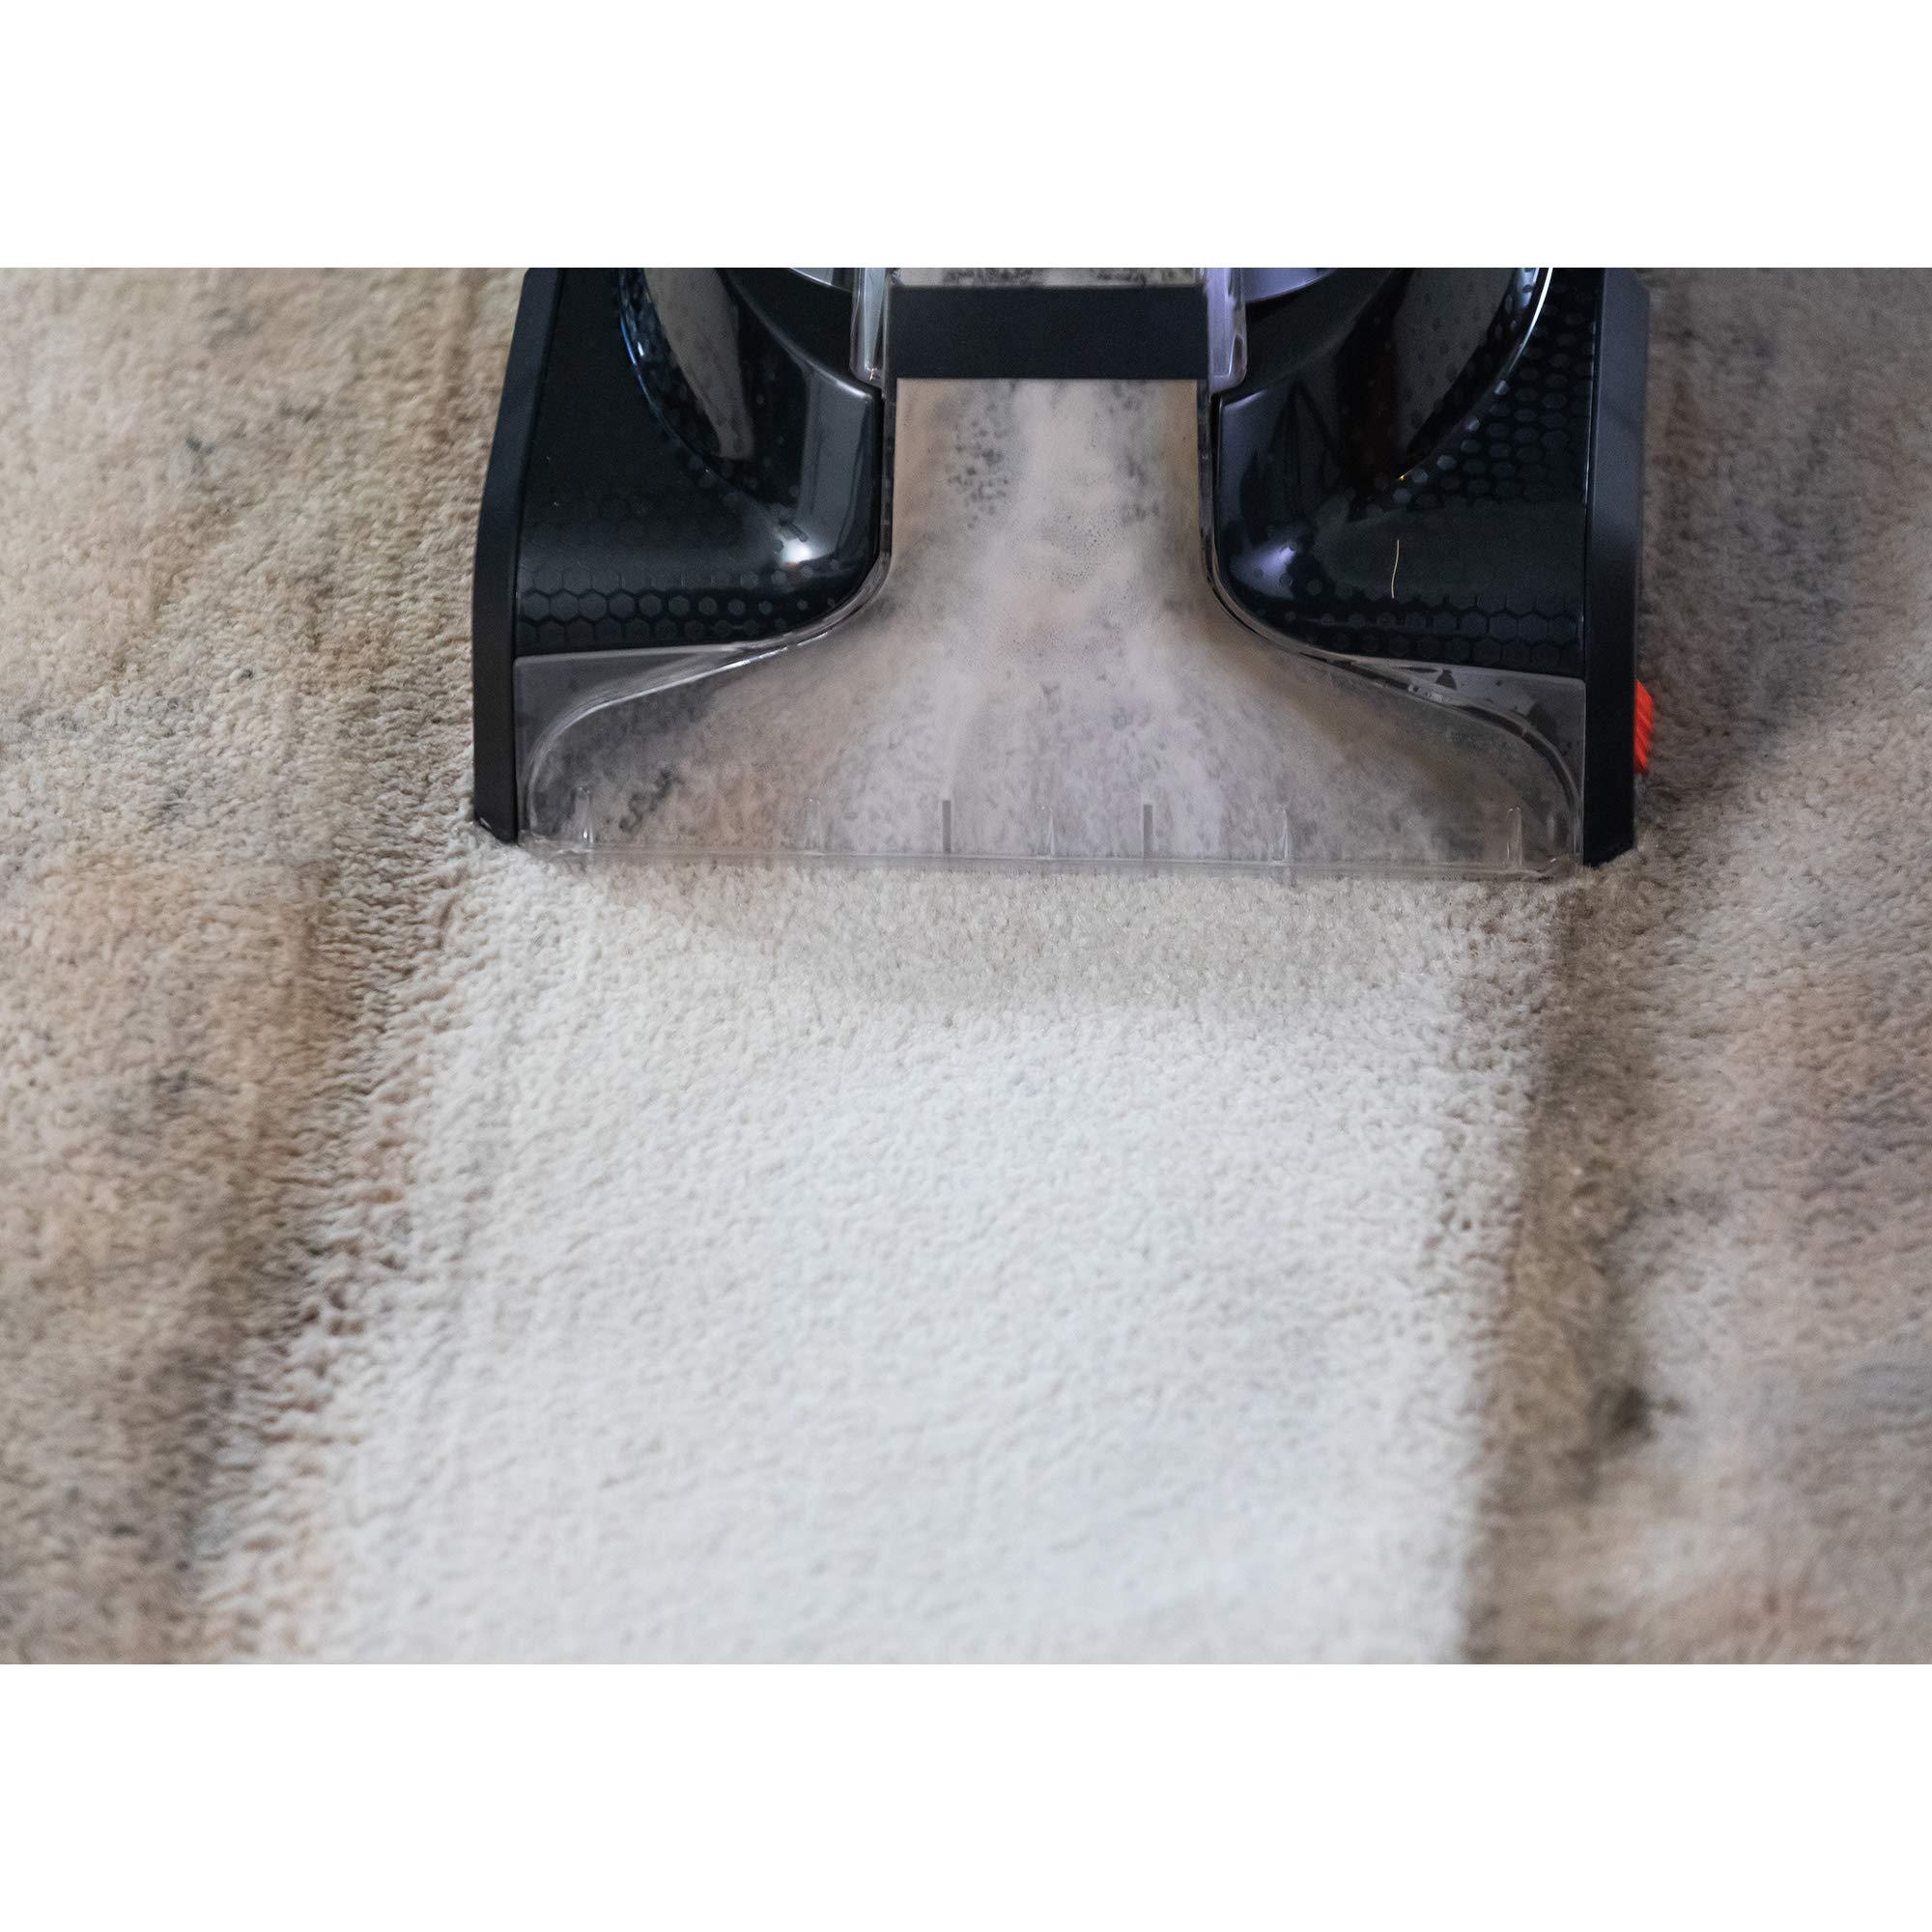 Zep Premium Carpet Shampoo 128 ounce ZUPXC128 (Pack of 2)